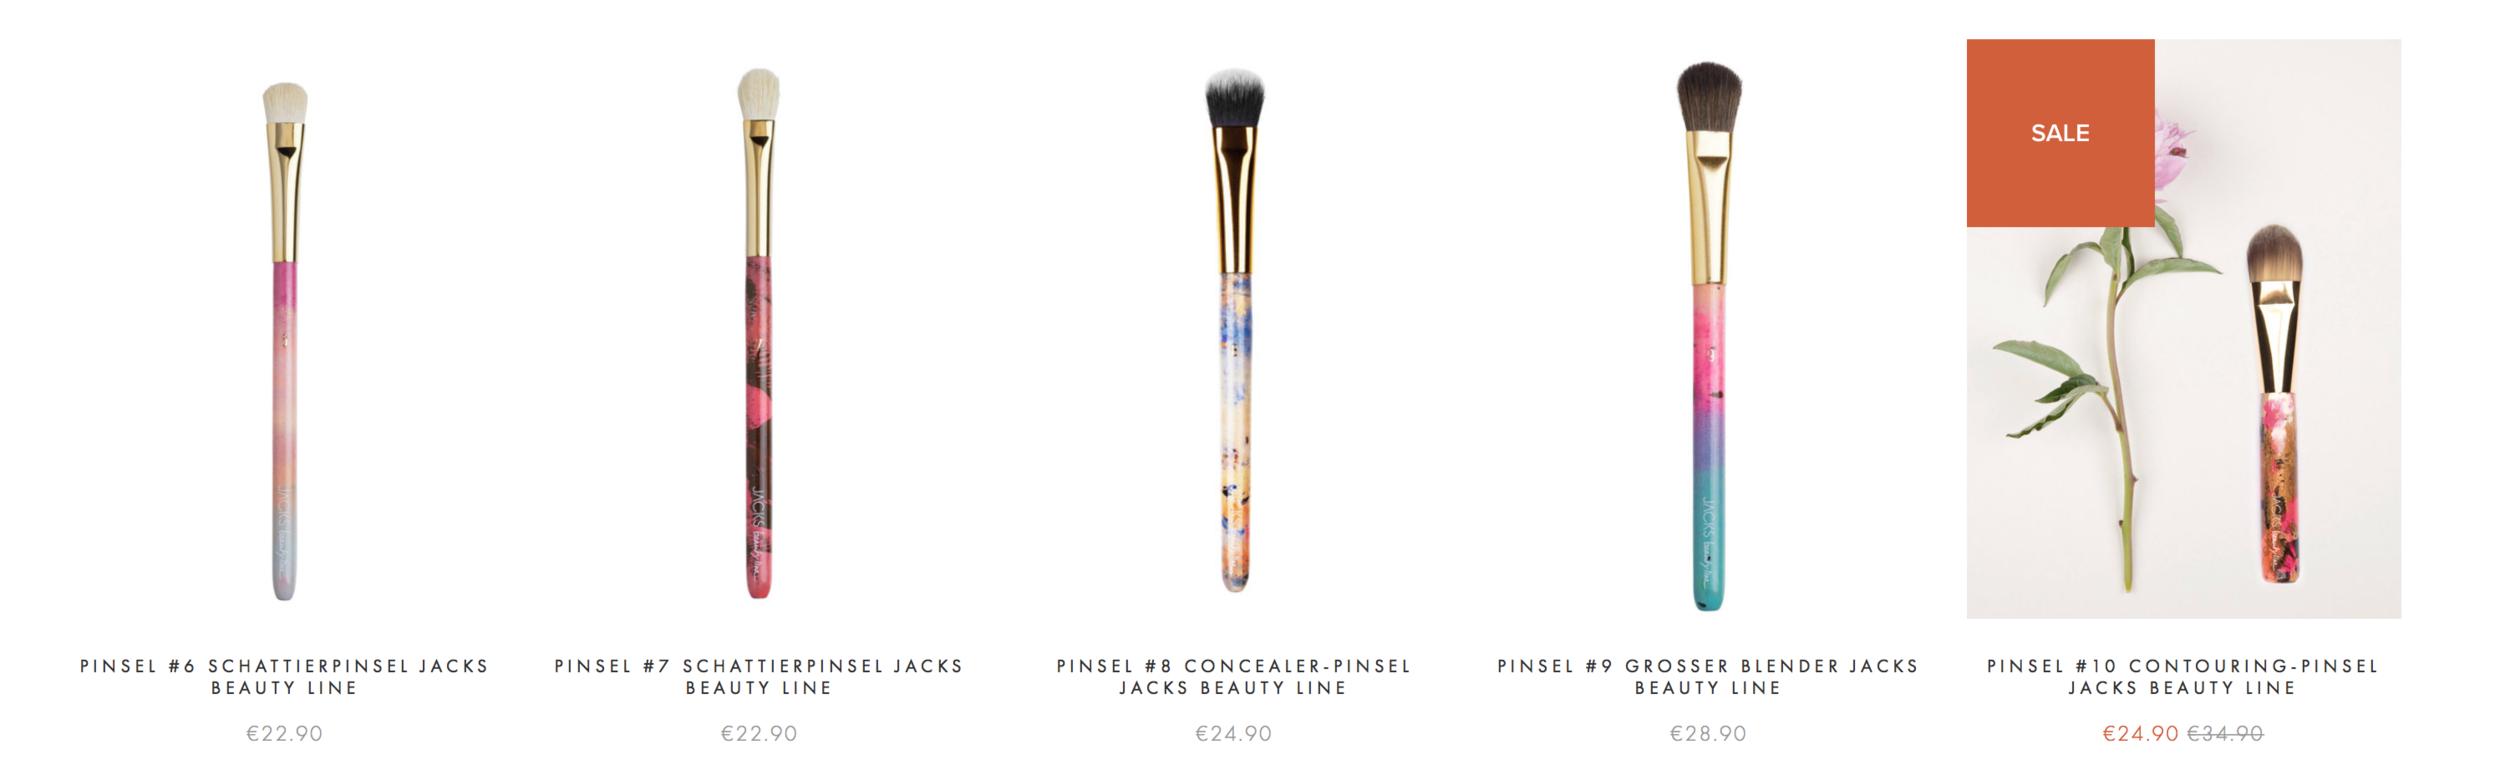 JACKS_beauty_line_Pinsel_shoppen.png